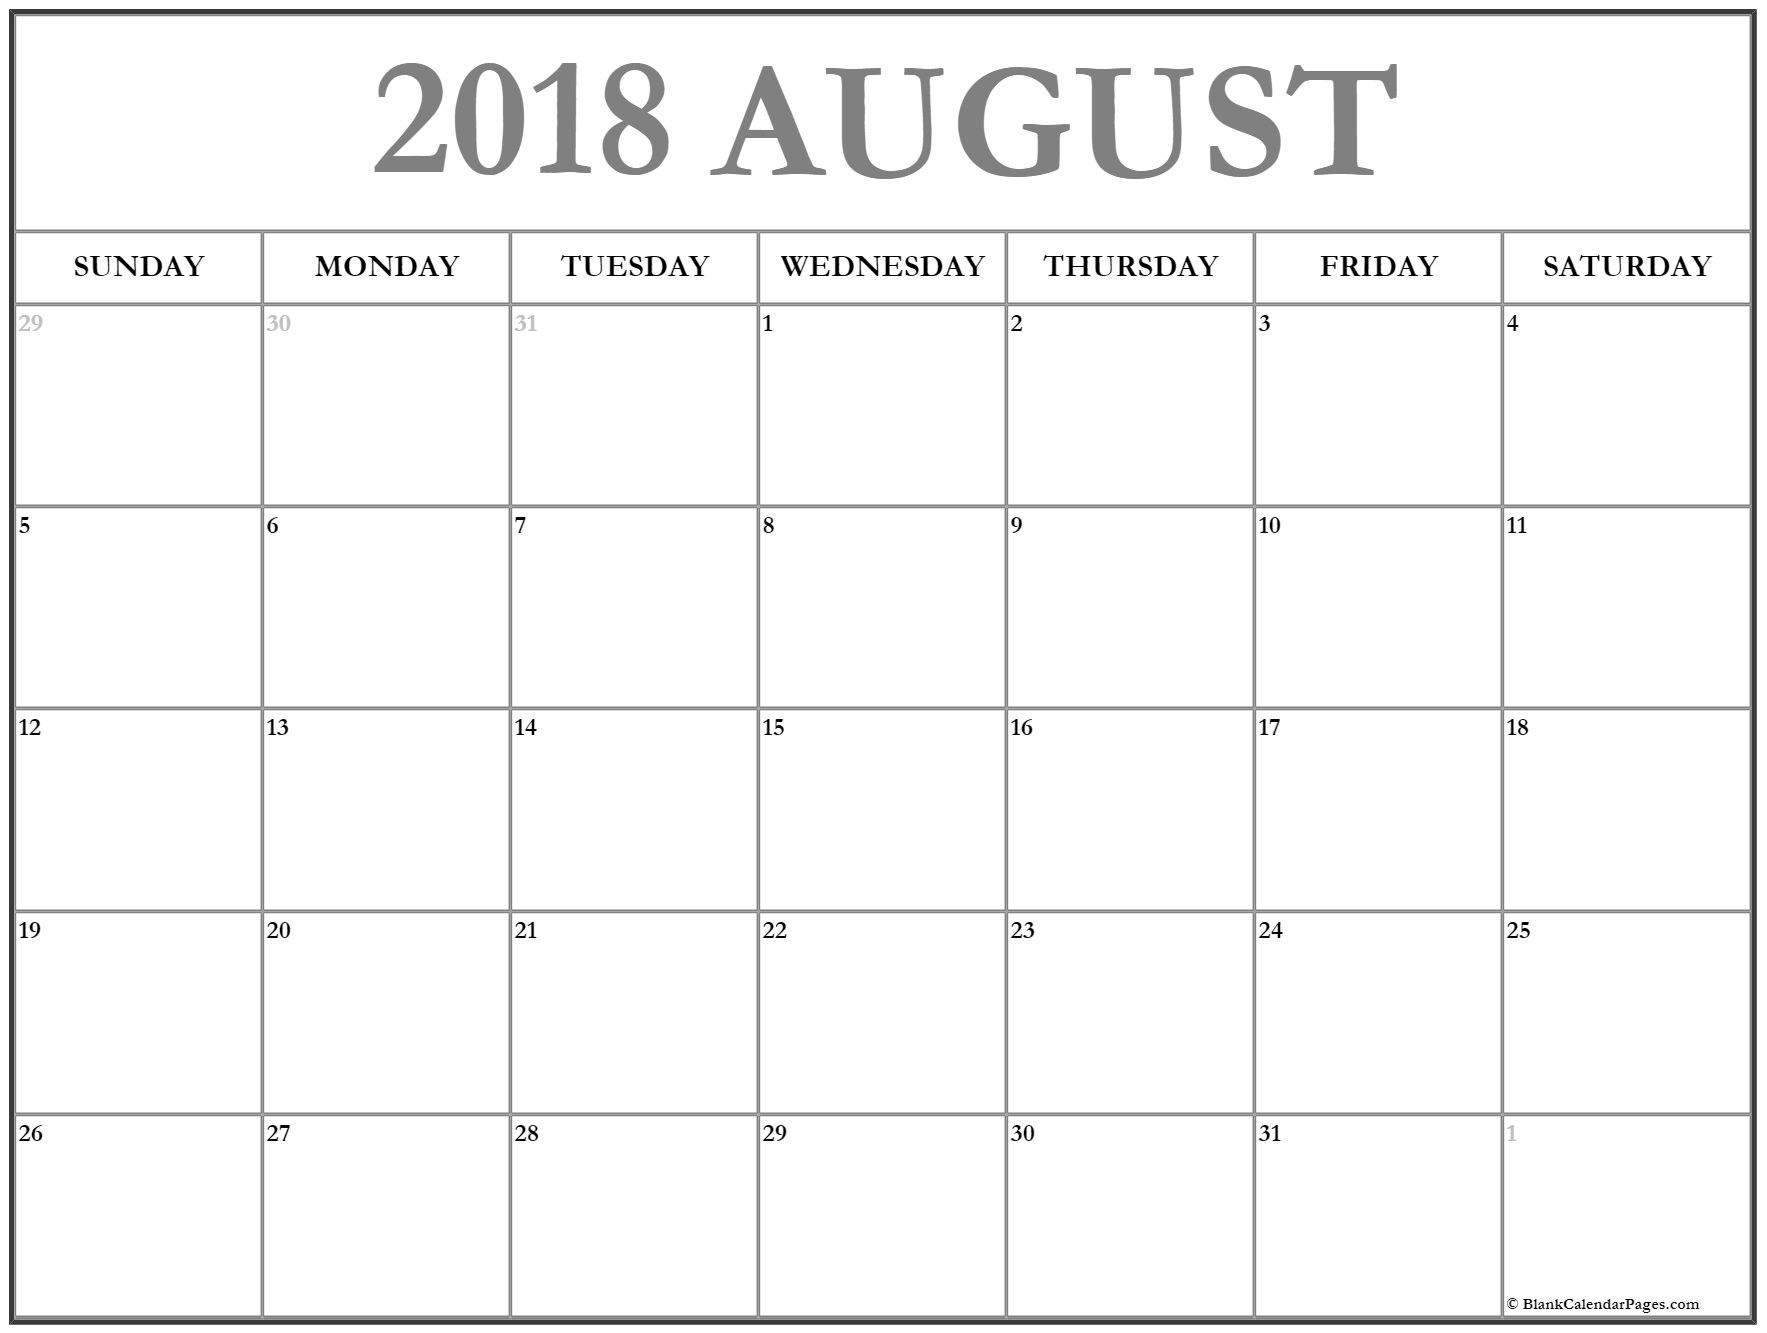 august 2018 calendar 51 calendar templates of 2018 calendars Calendar August 2018 Uk List erdferdf